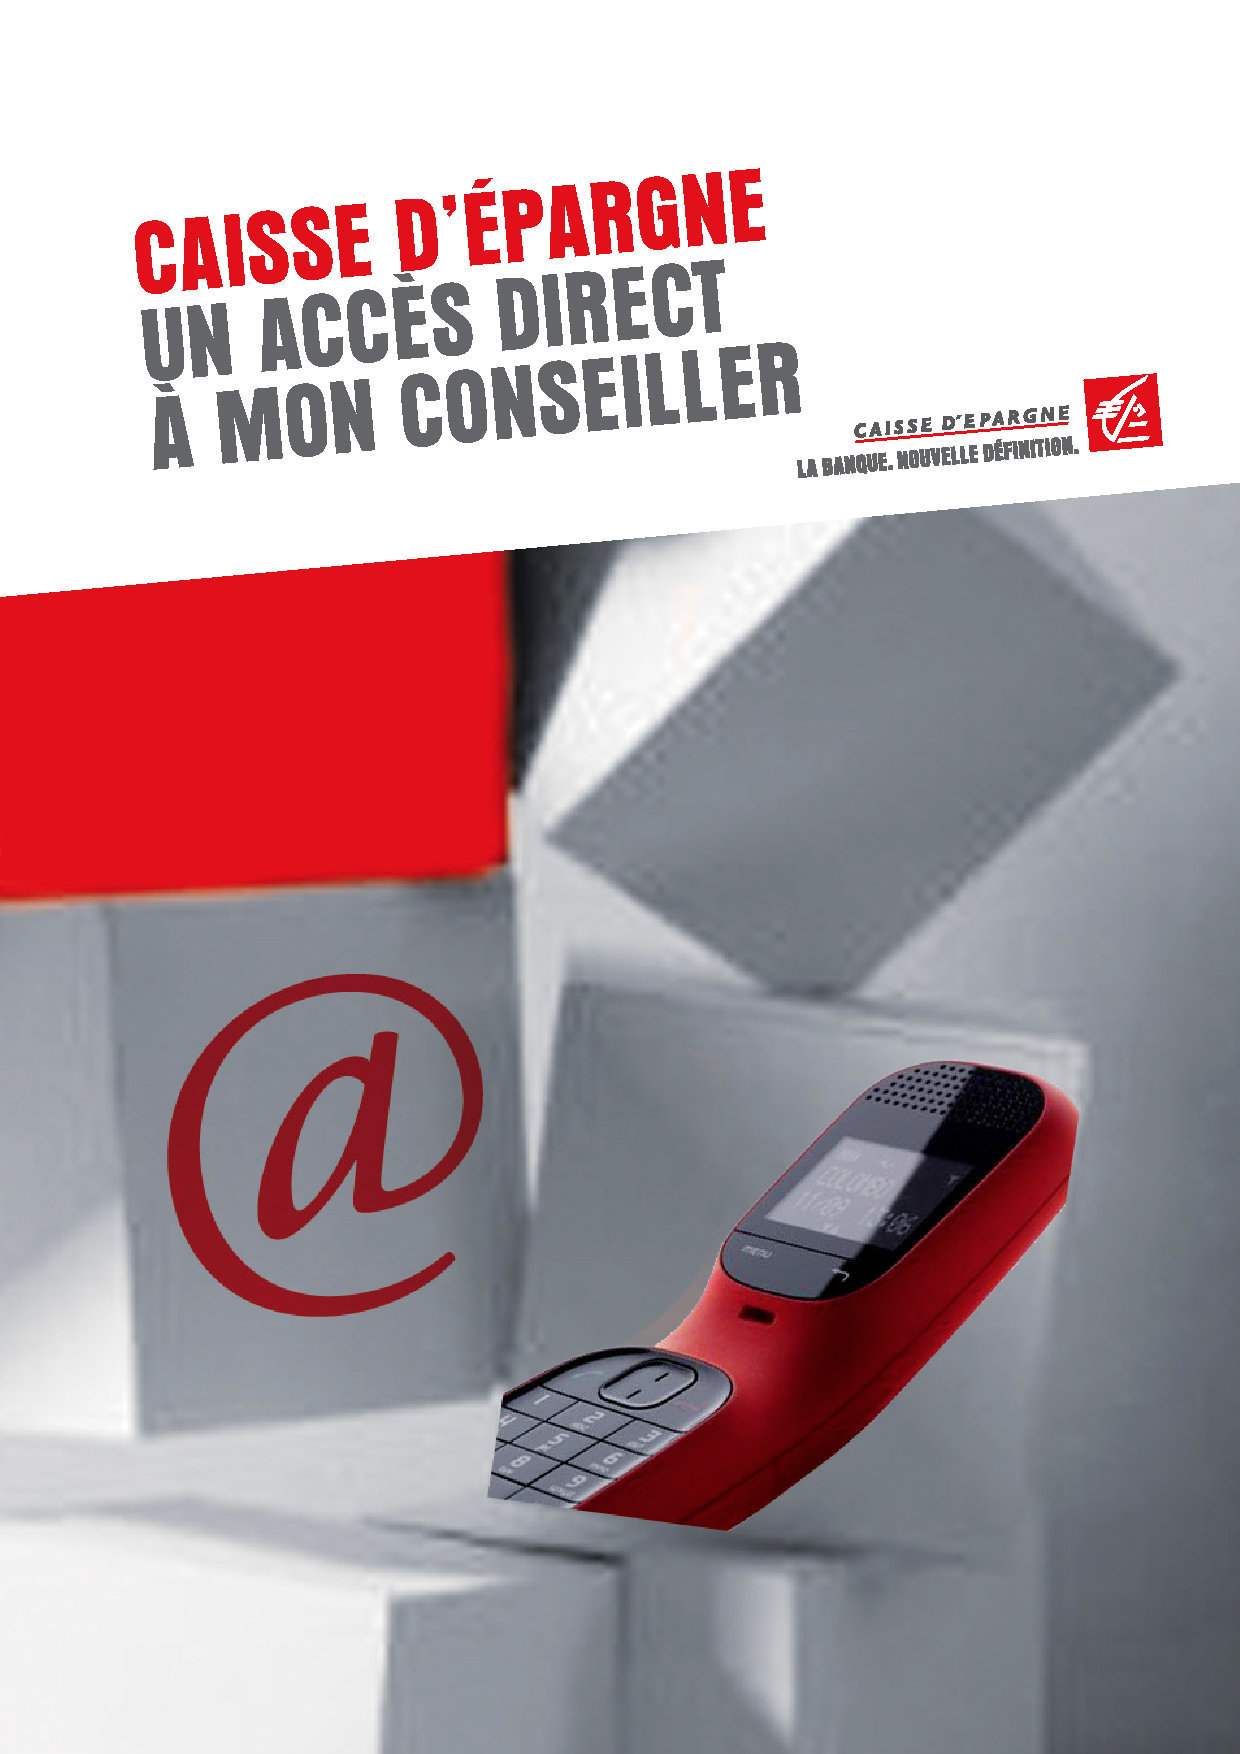 "<font color=""#aaa7a6"">Communication en magasin, maquette.</font>"